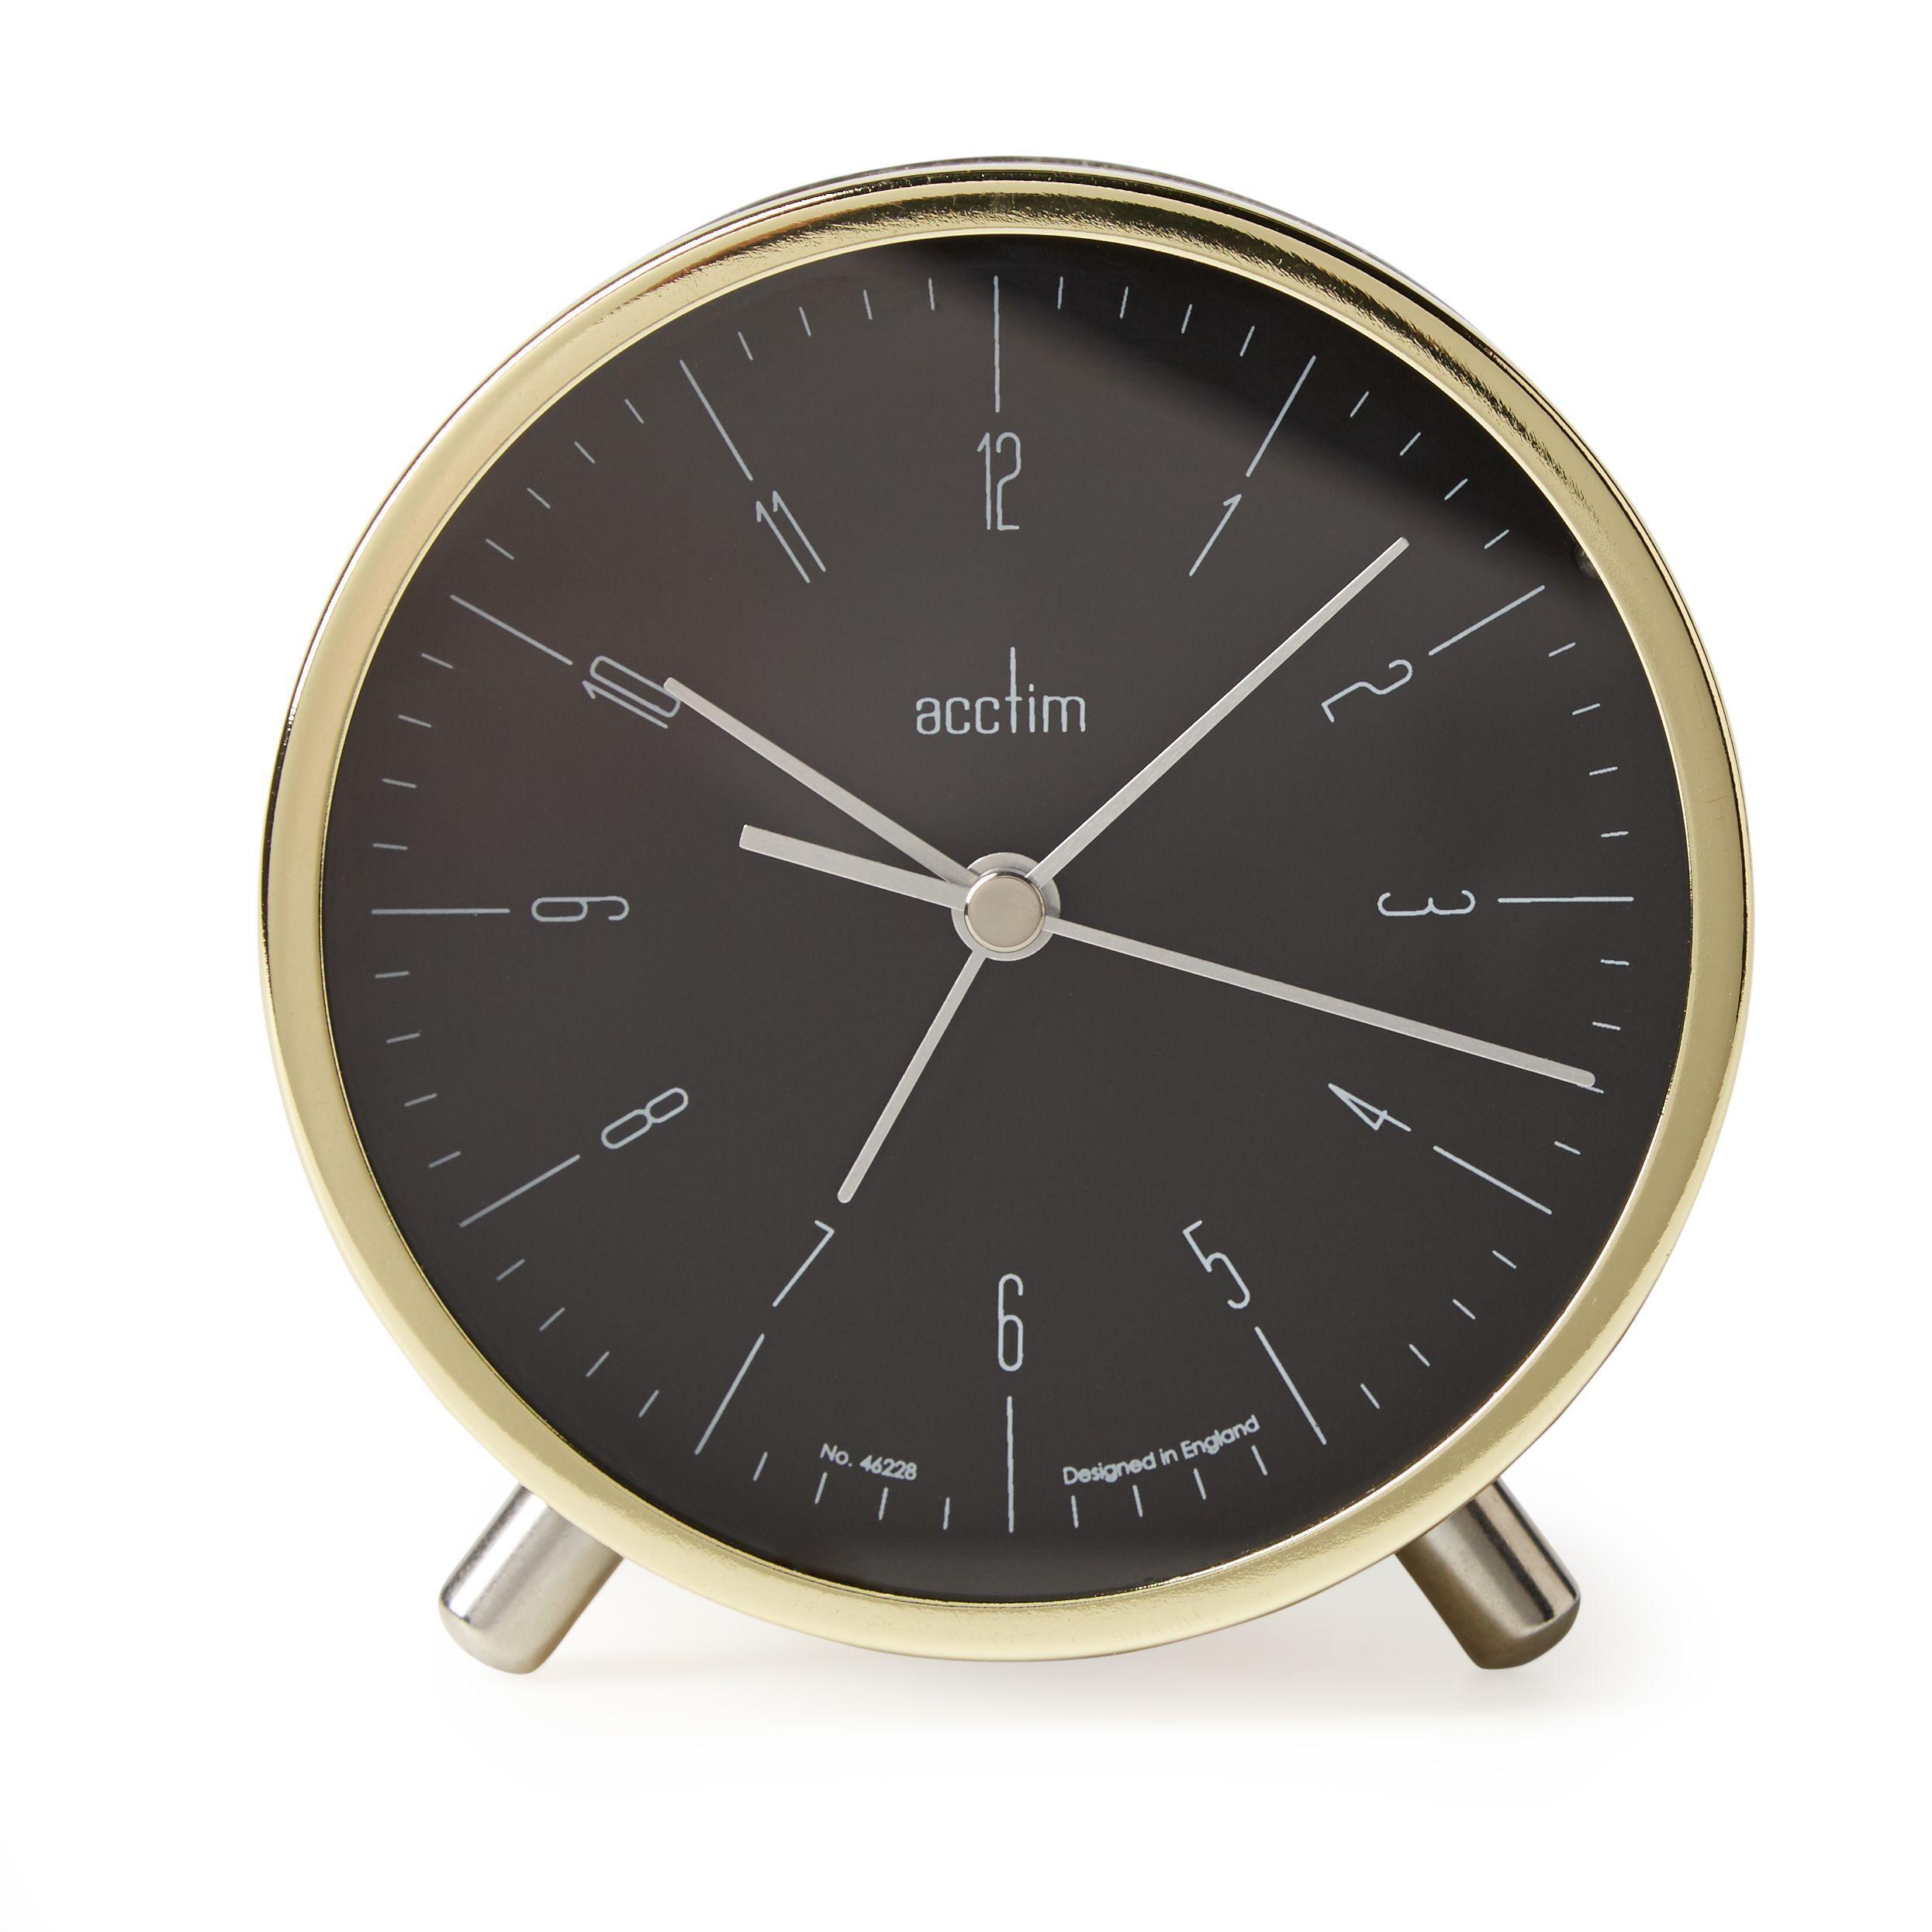 Acctim evo retro gold analogue alarm clock departments diy at bq amipublicfo Choice Image